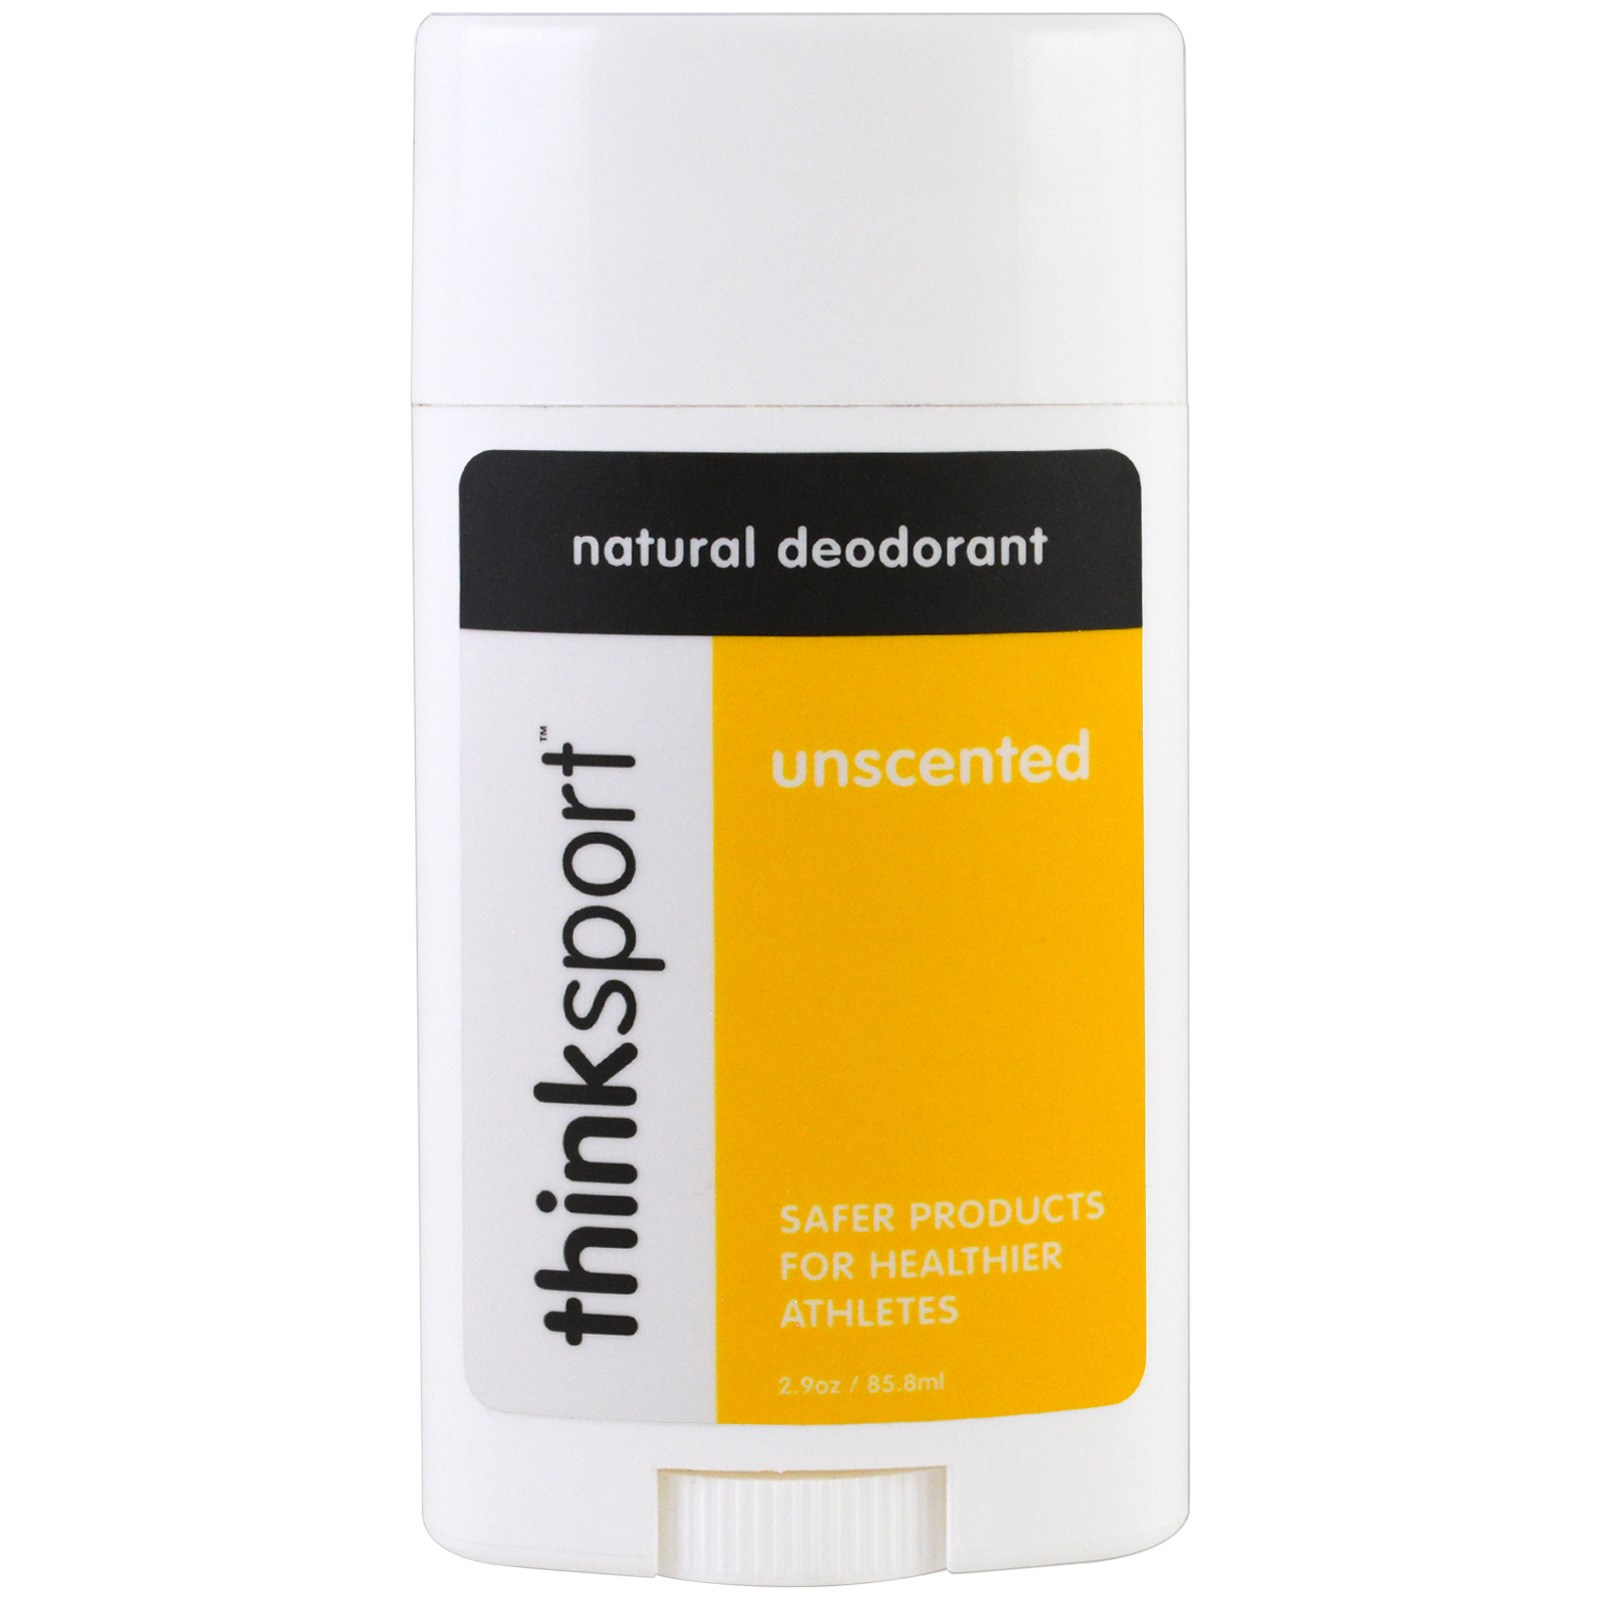 Think, Thinksport, натуральный дезодорант, без запаха, 2,9 унции (85,8 мл)